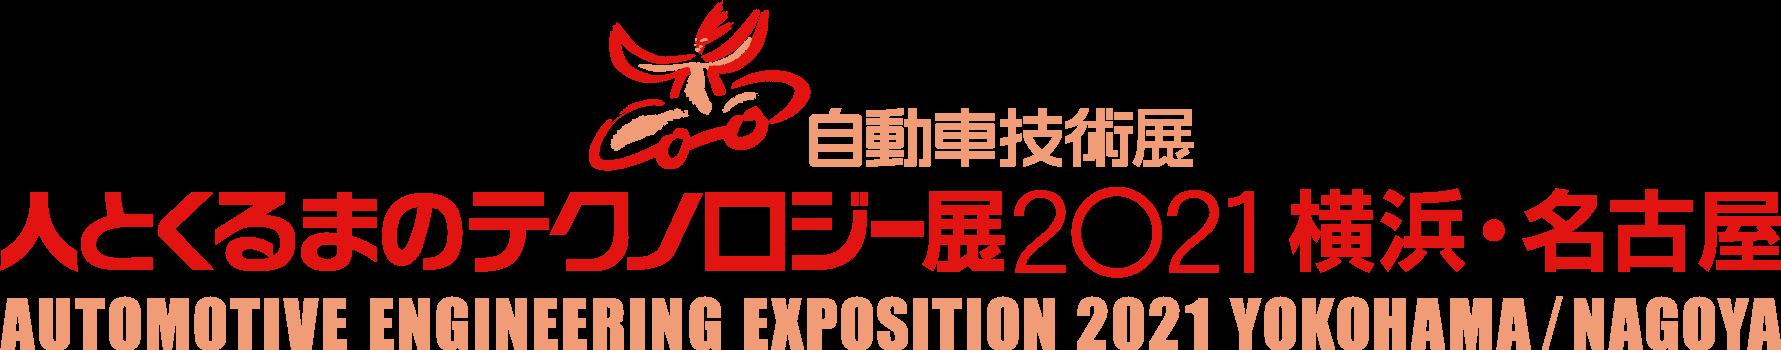 [NEW!] AUTOMOTIVE ENGINEERING EXPOSITION 2021